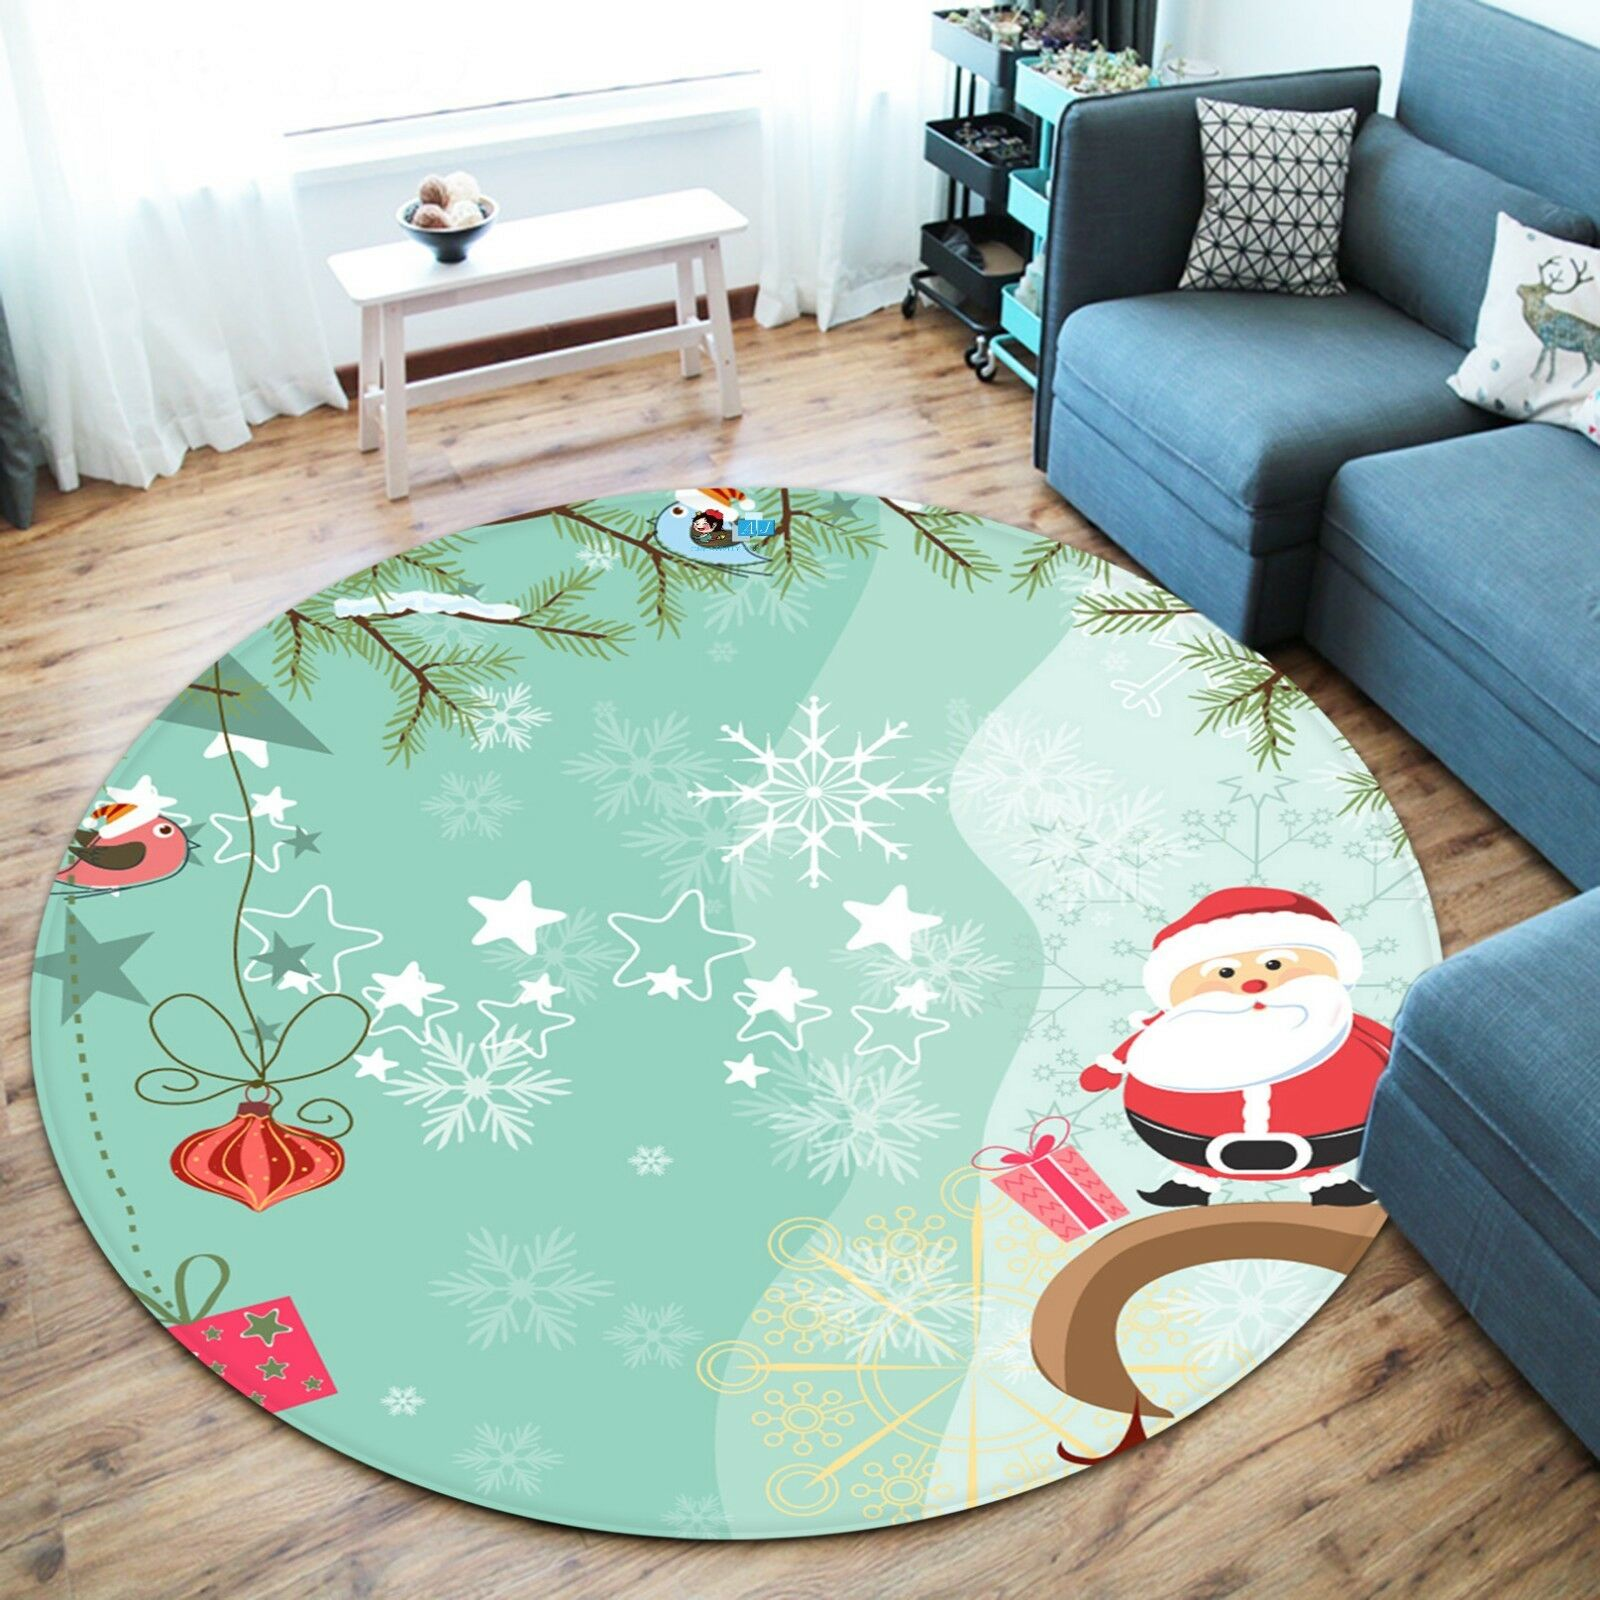 3D Christmas Xmas Poster Cute 231 Non Slip Rug Rug Rug Mat Room Mat Round Elegant Carpet 6572a5